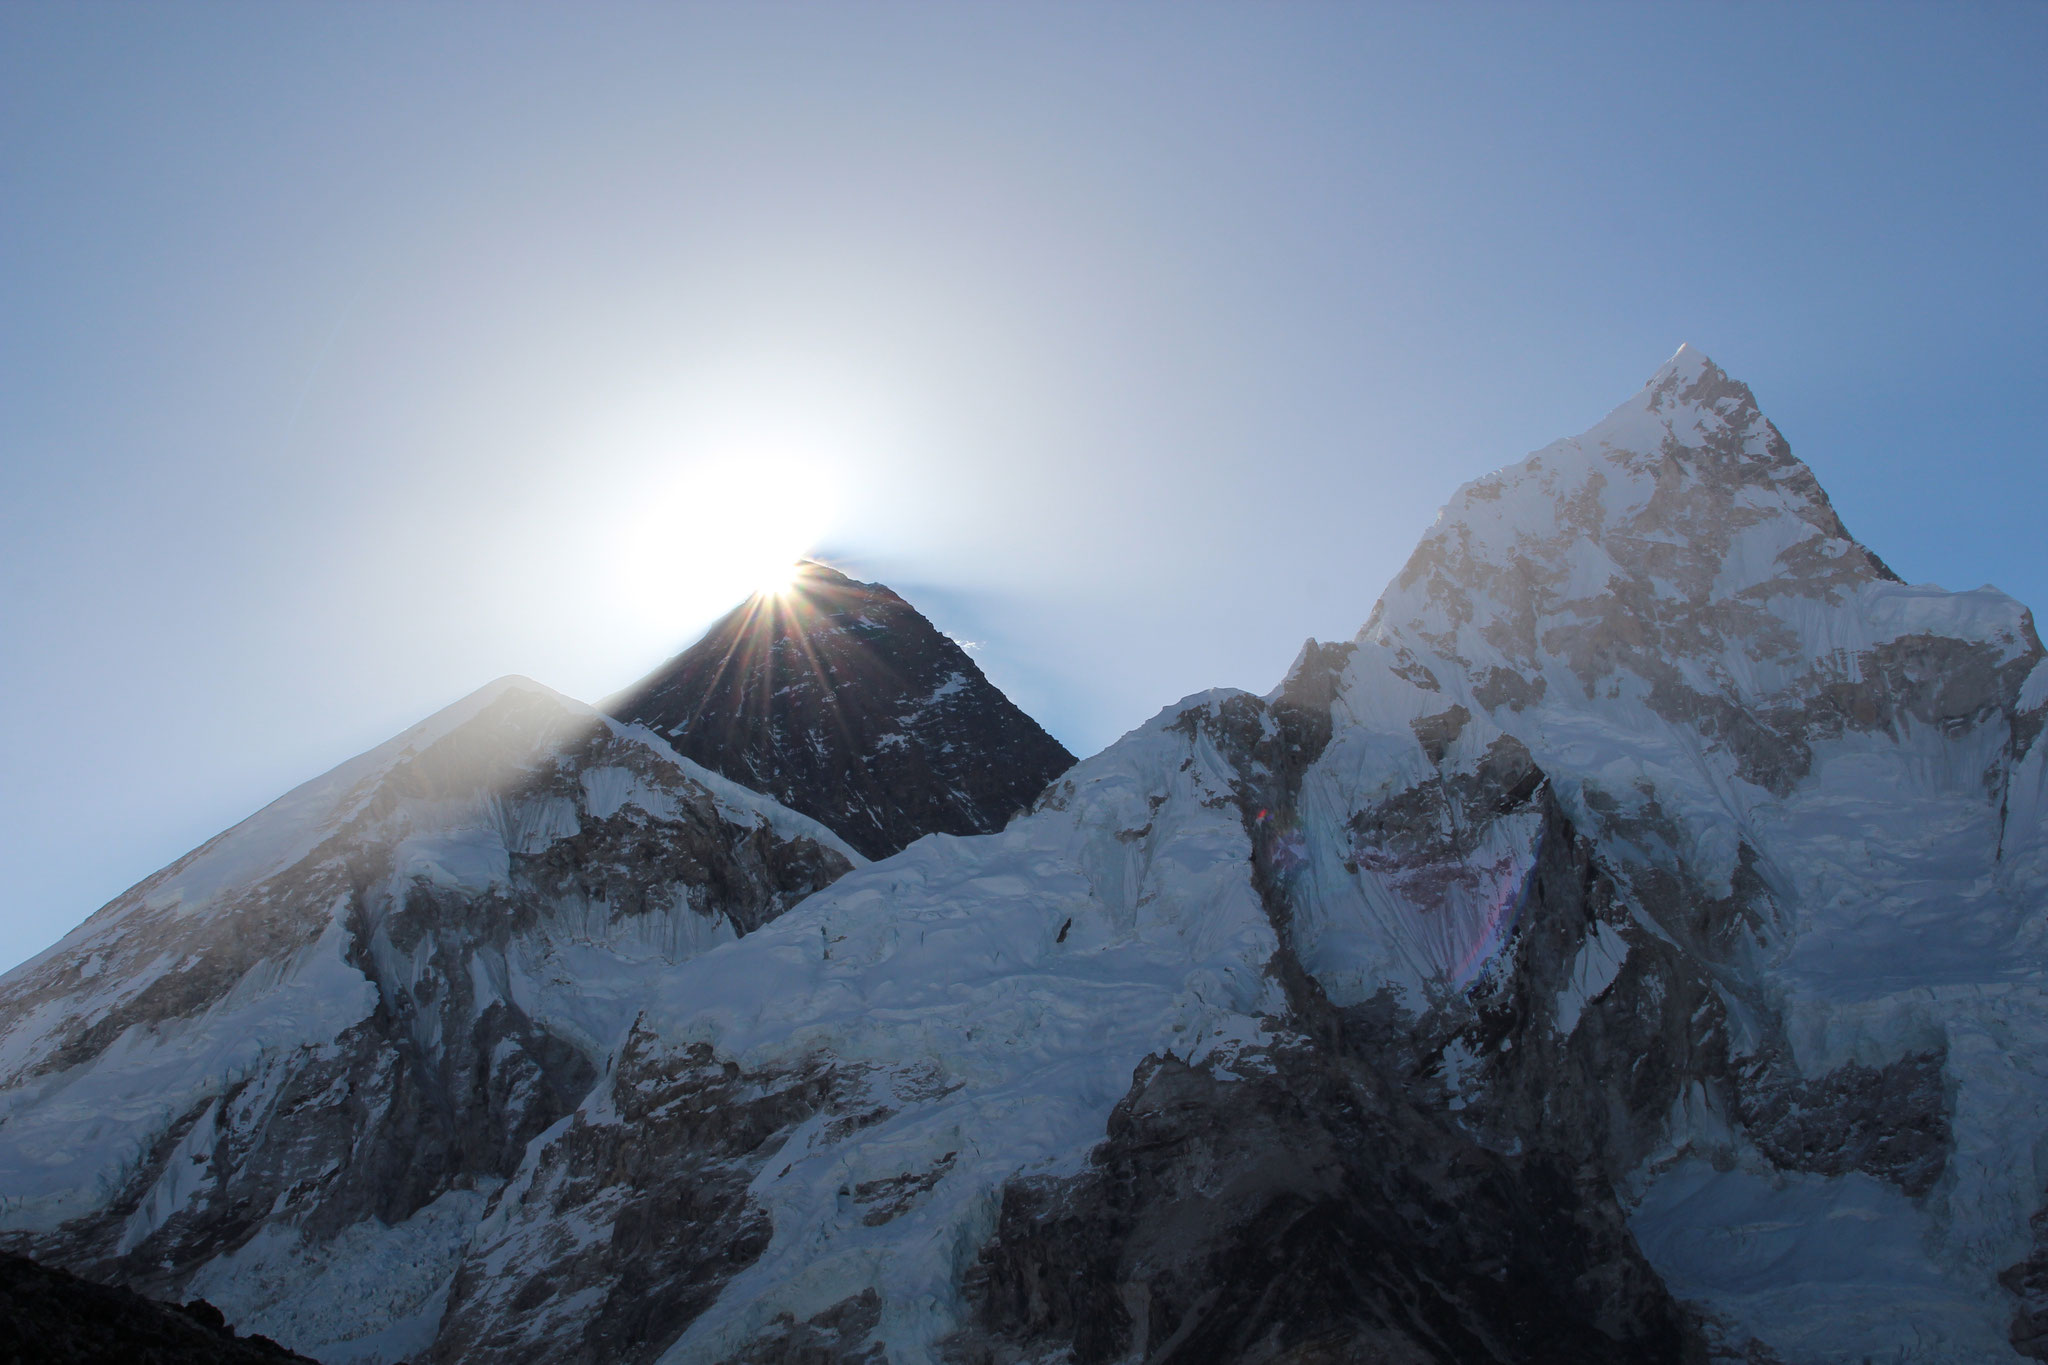 Nepal. Just wow! Sonnenaufgang hinterm Everest. 2013